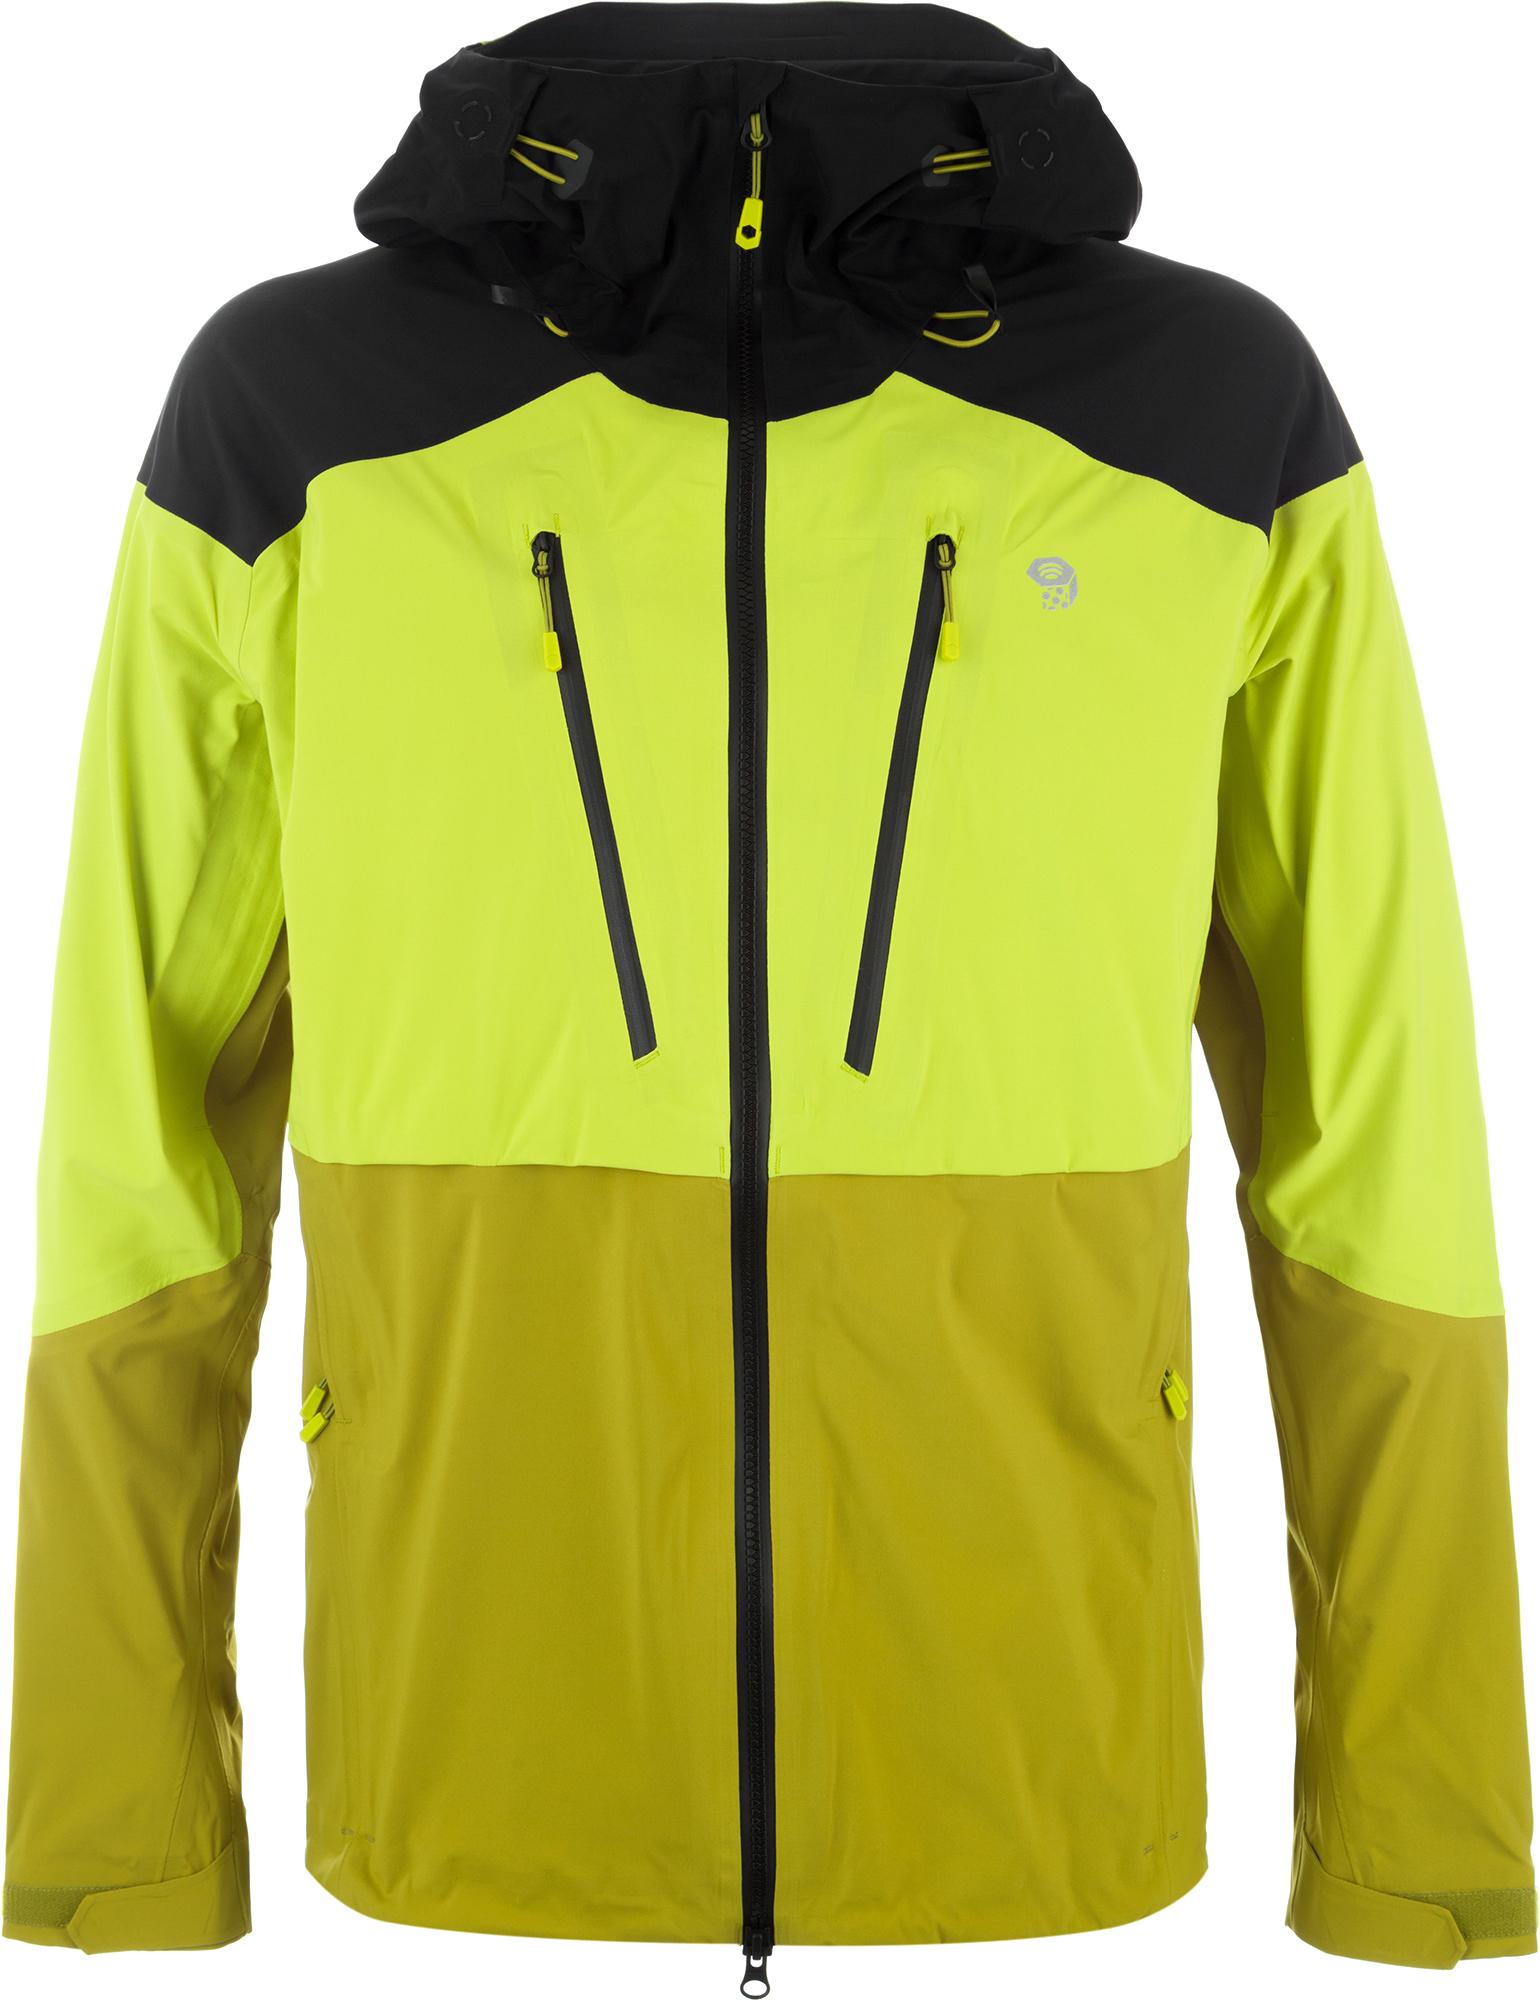 цена на Mountain Hardwear Ветровка мужская Mountain Hardwear Cyclone, размер 54